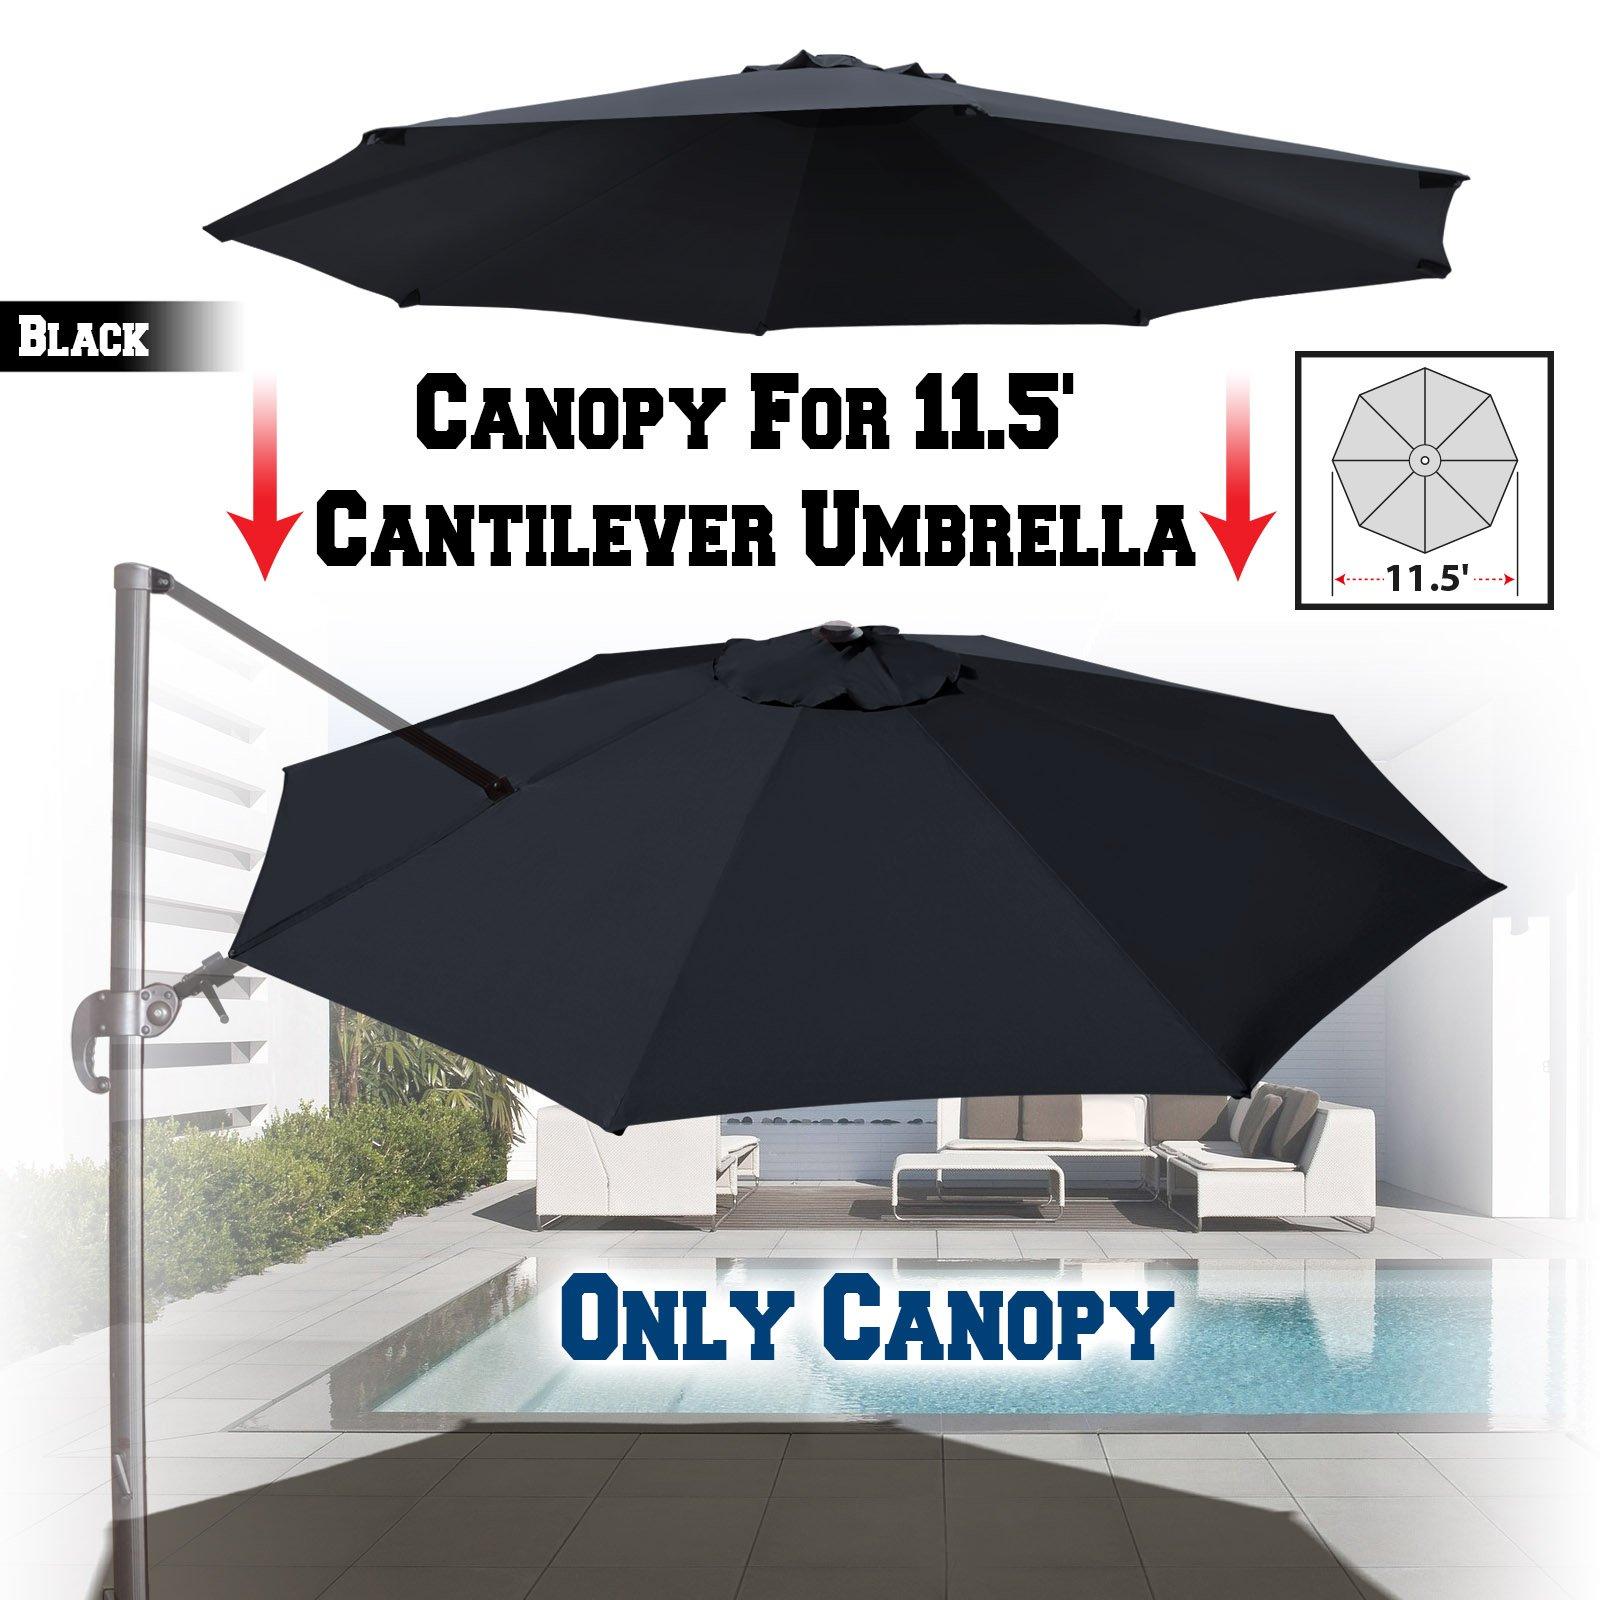 BenefitUSA Replacement Canopy for 11.5' Roma Cantilever Patio Umbrella Parasol Top Cover (Black) by BenefitUSA